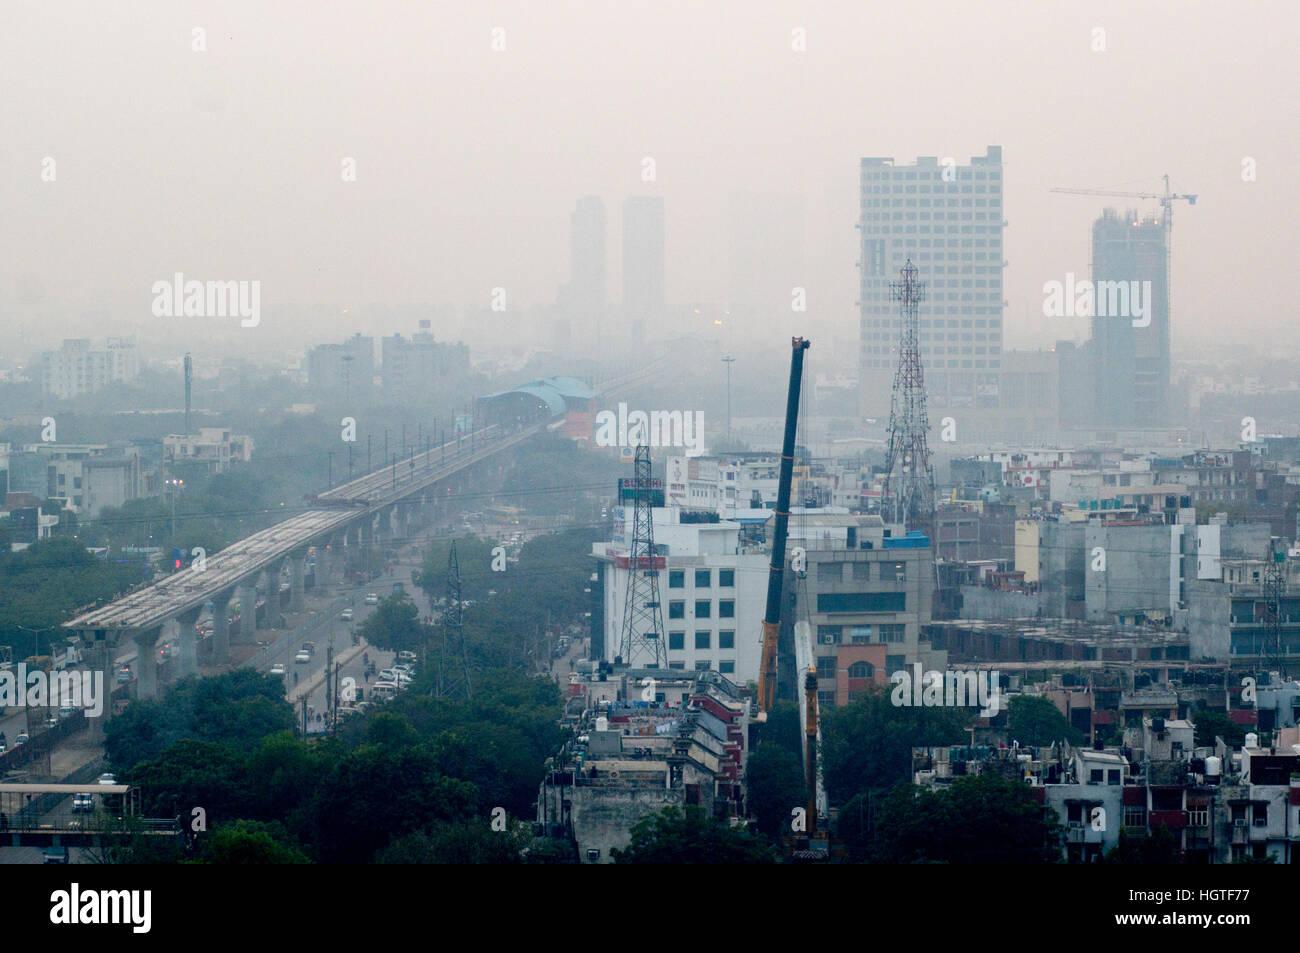 Pollution in Noida Delhi against the cityscape - Stock Image